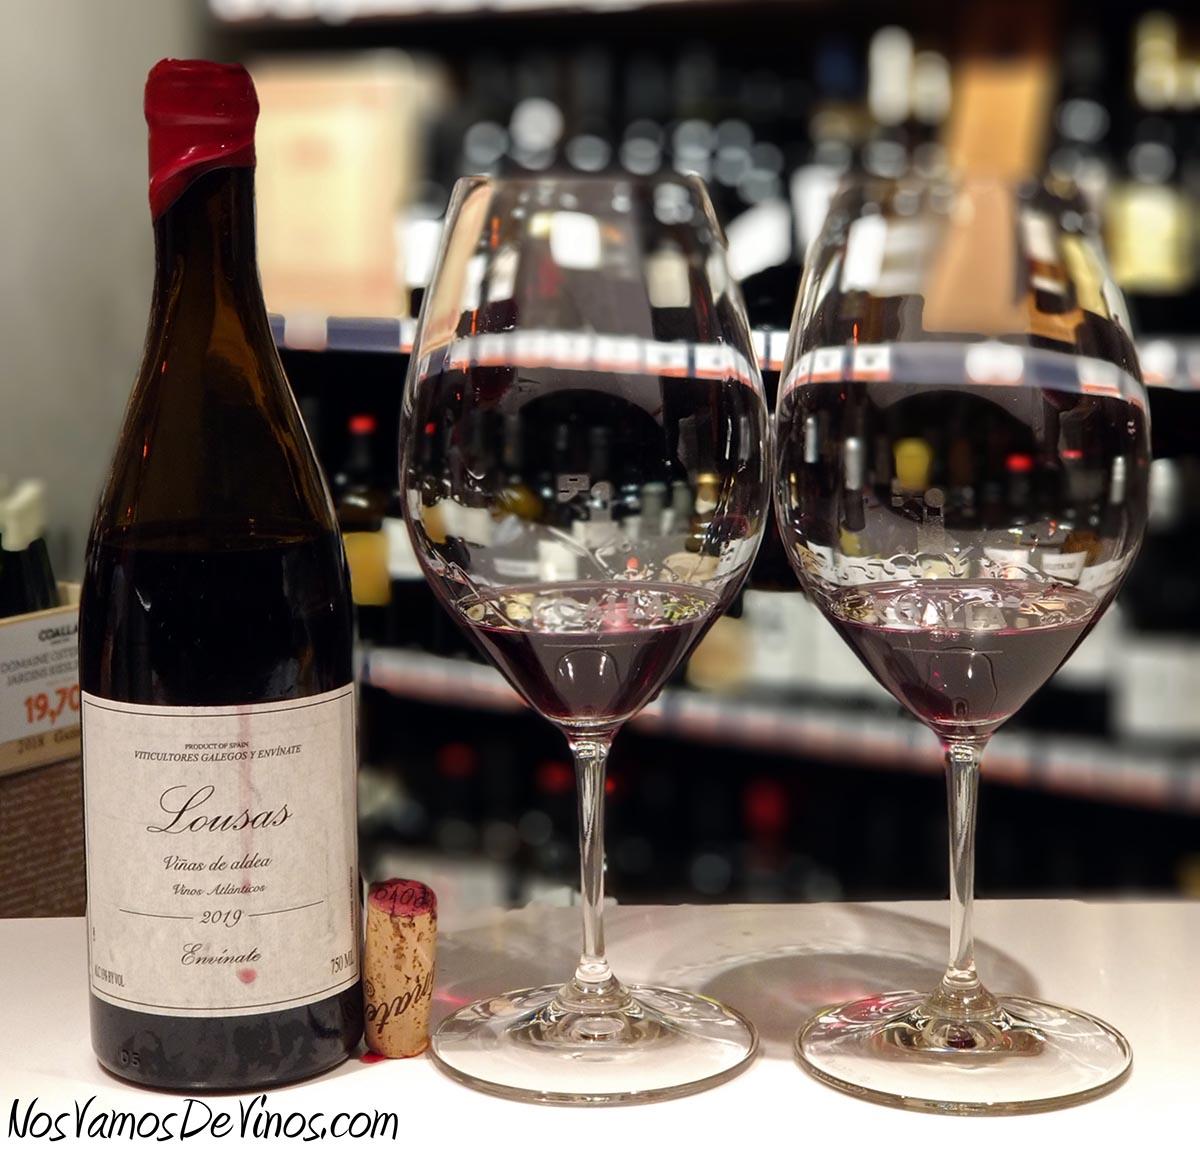 Lousas Viñas de Aldea 2019